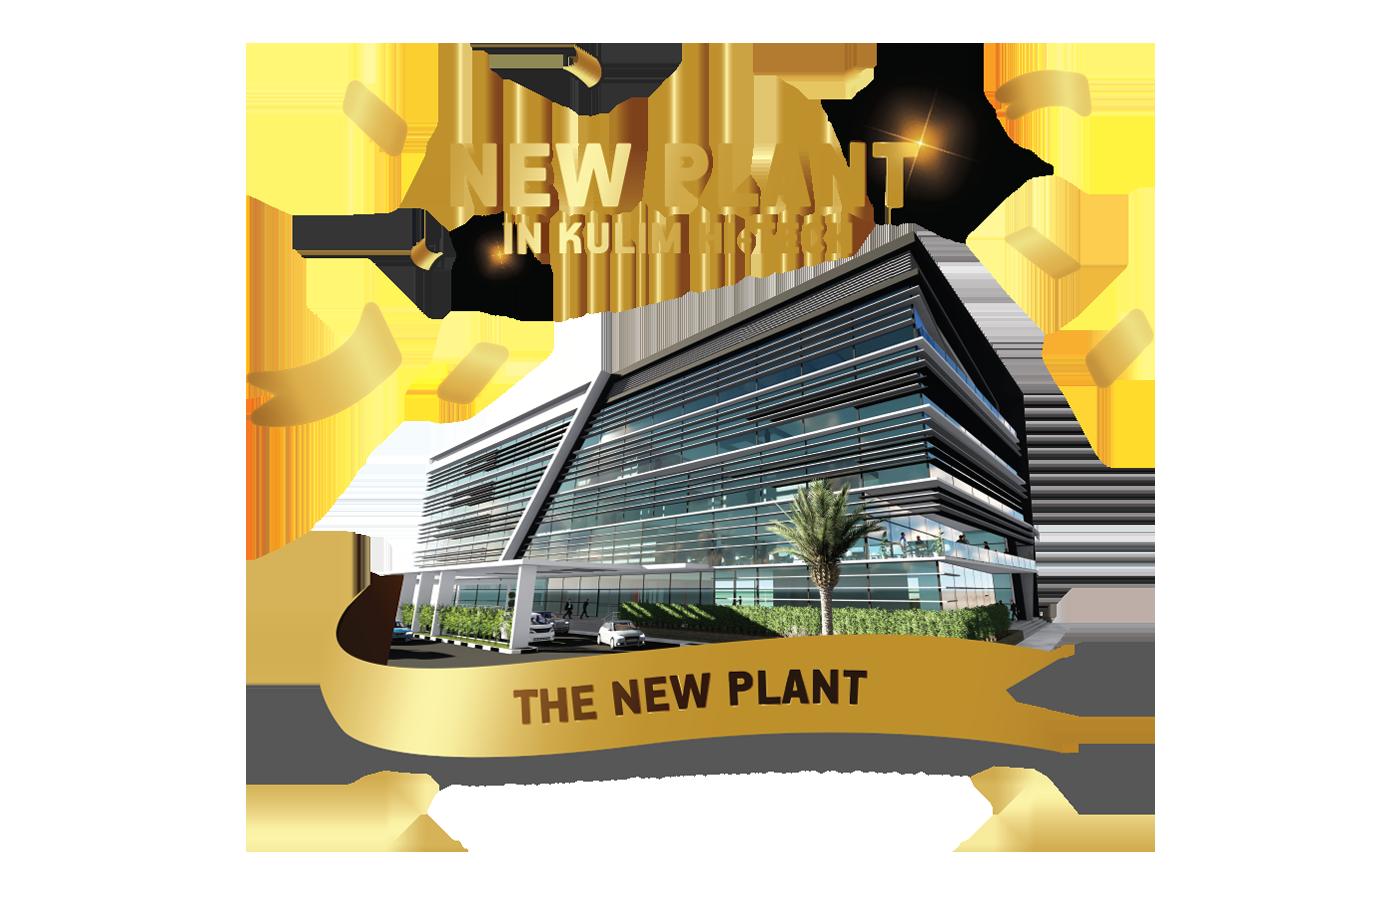 New Plant Kulim